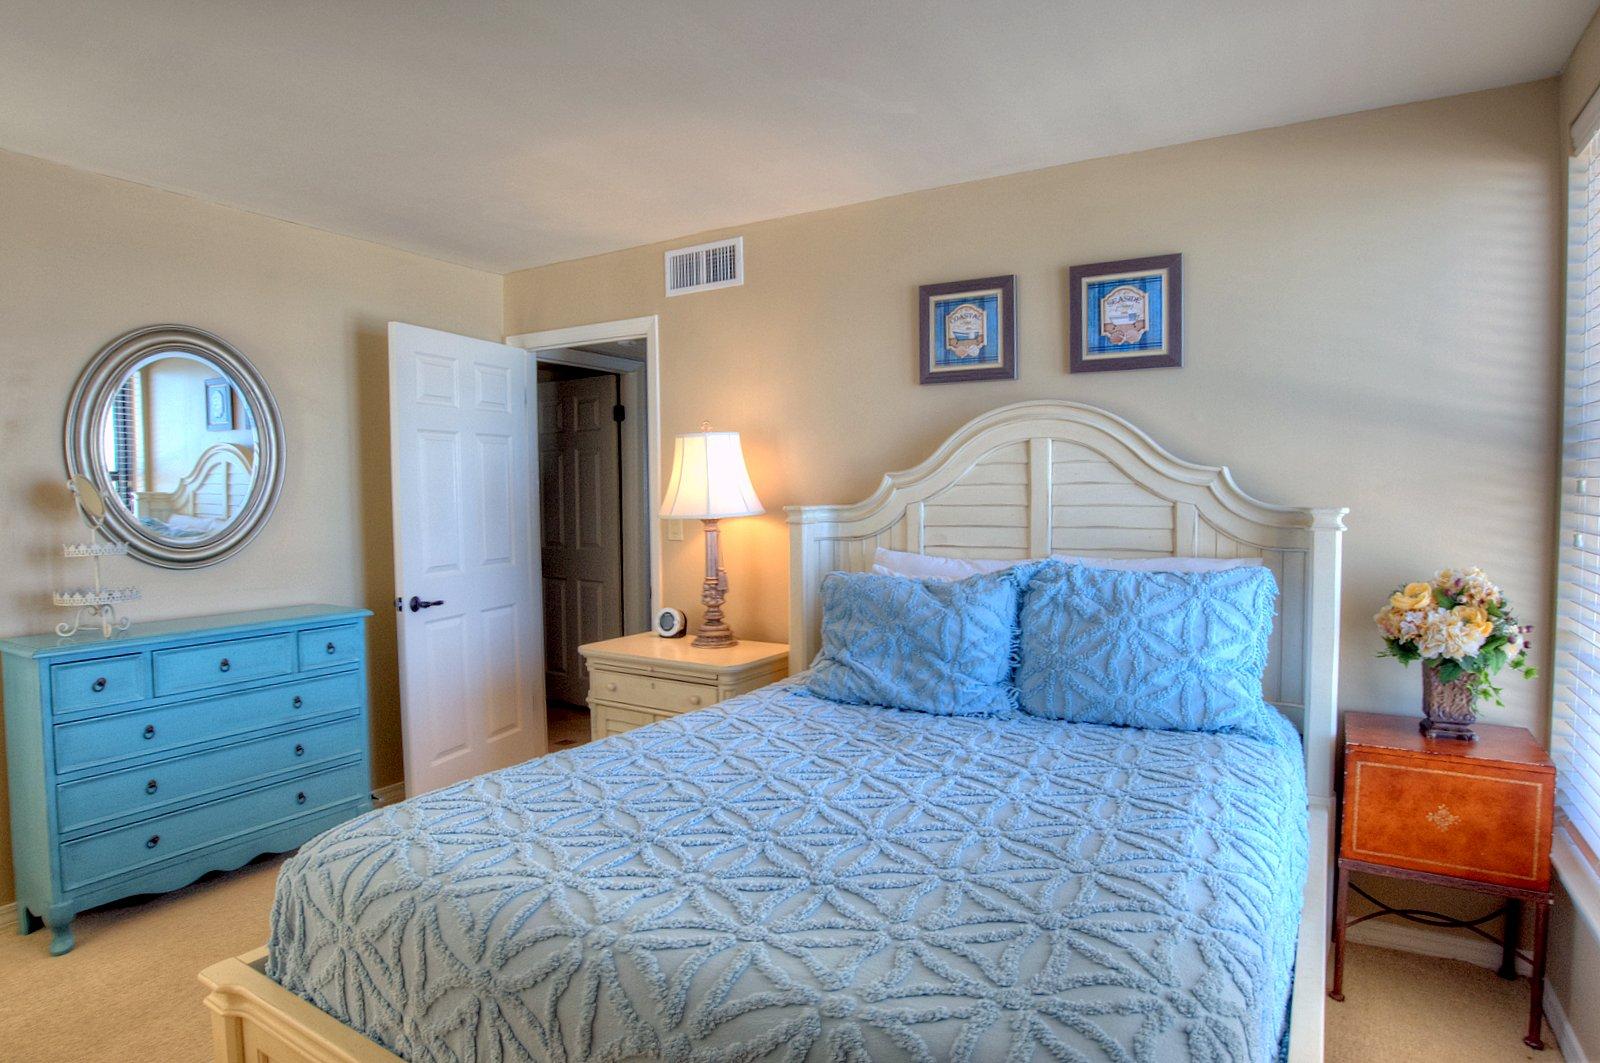 4106 Beachside One Condo rental in Beachside Towers at Sandestin in Destin Florida - #15